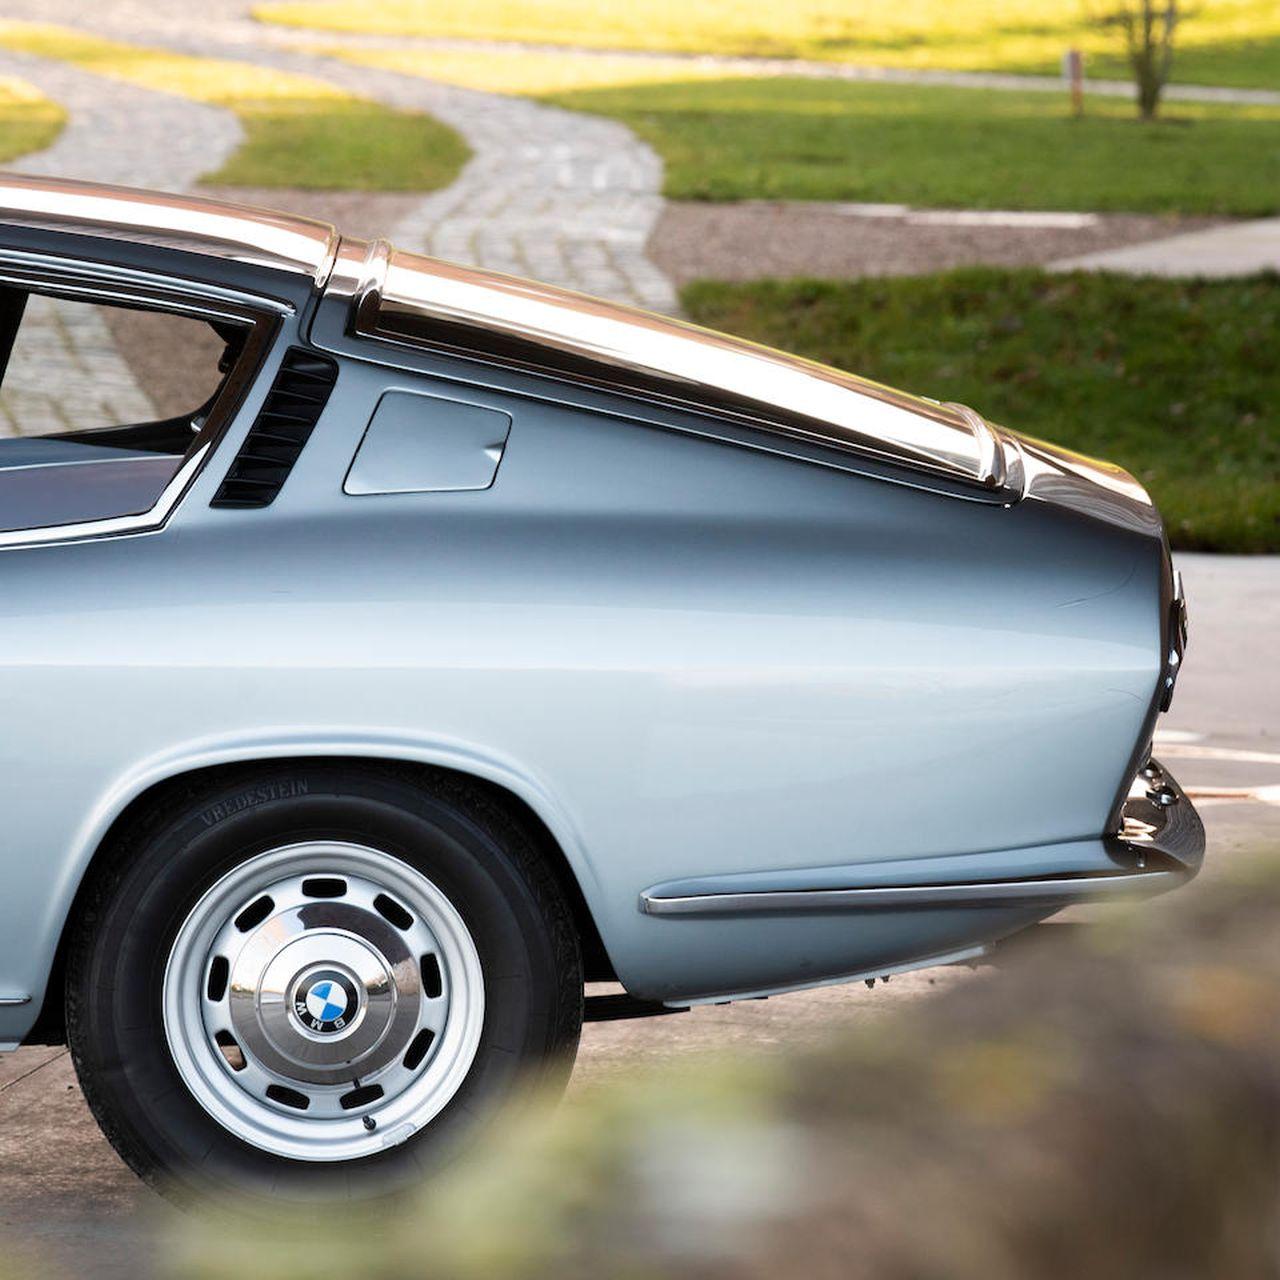 BMW-Glas 3000 V8 Fastback Coupé - J'ai plus de souffle ! 5